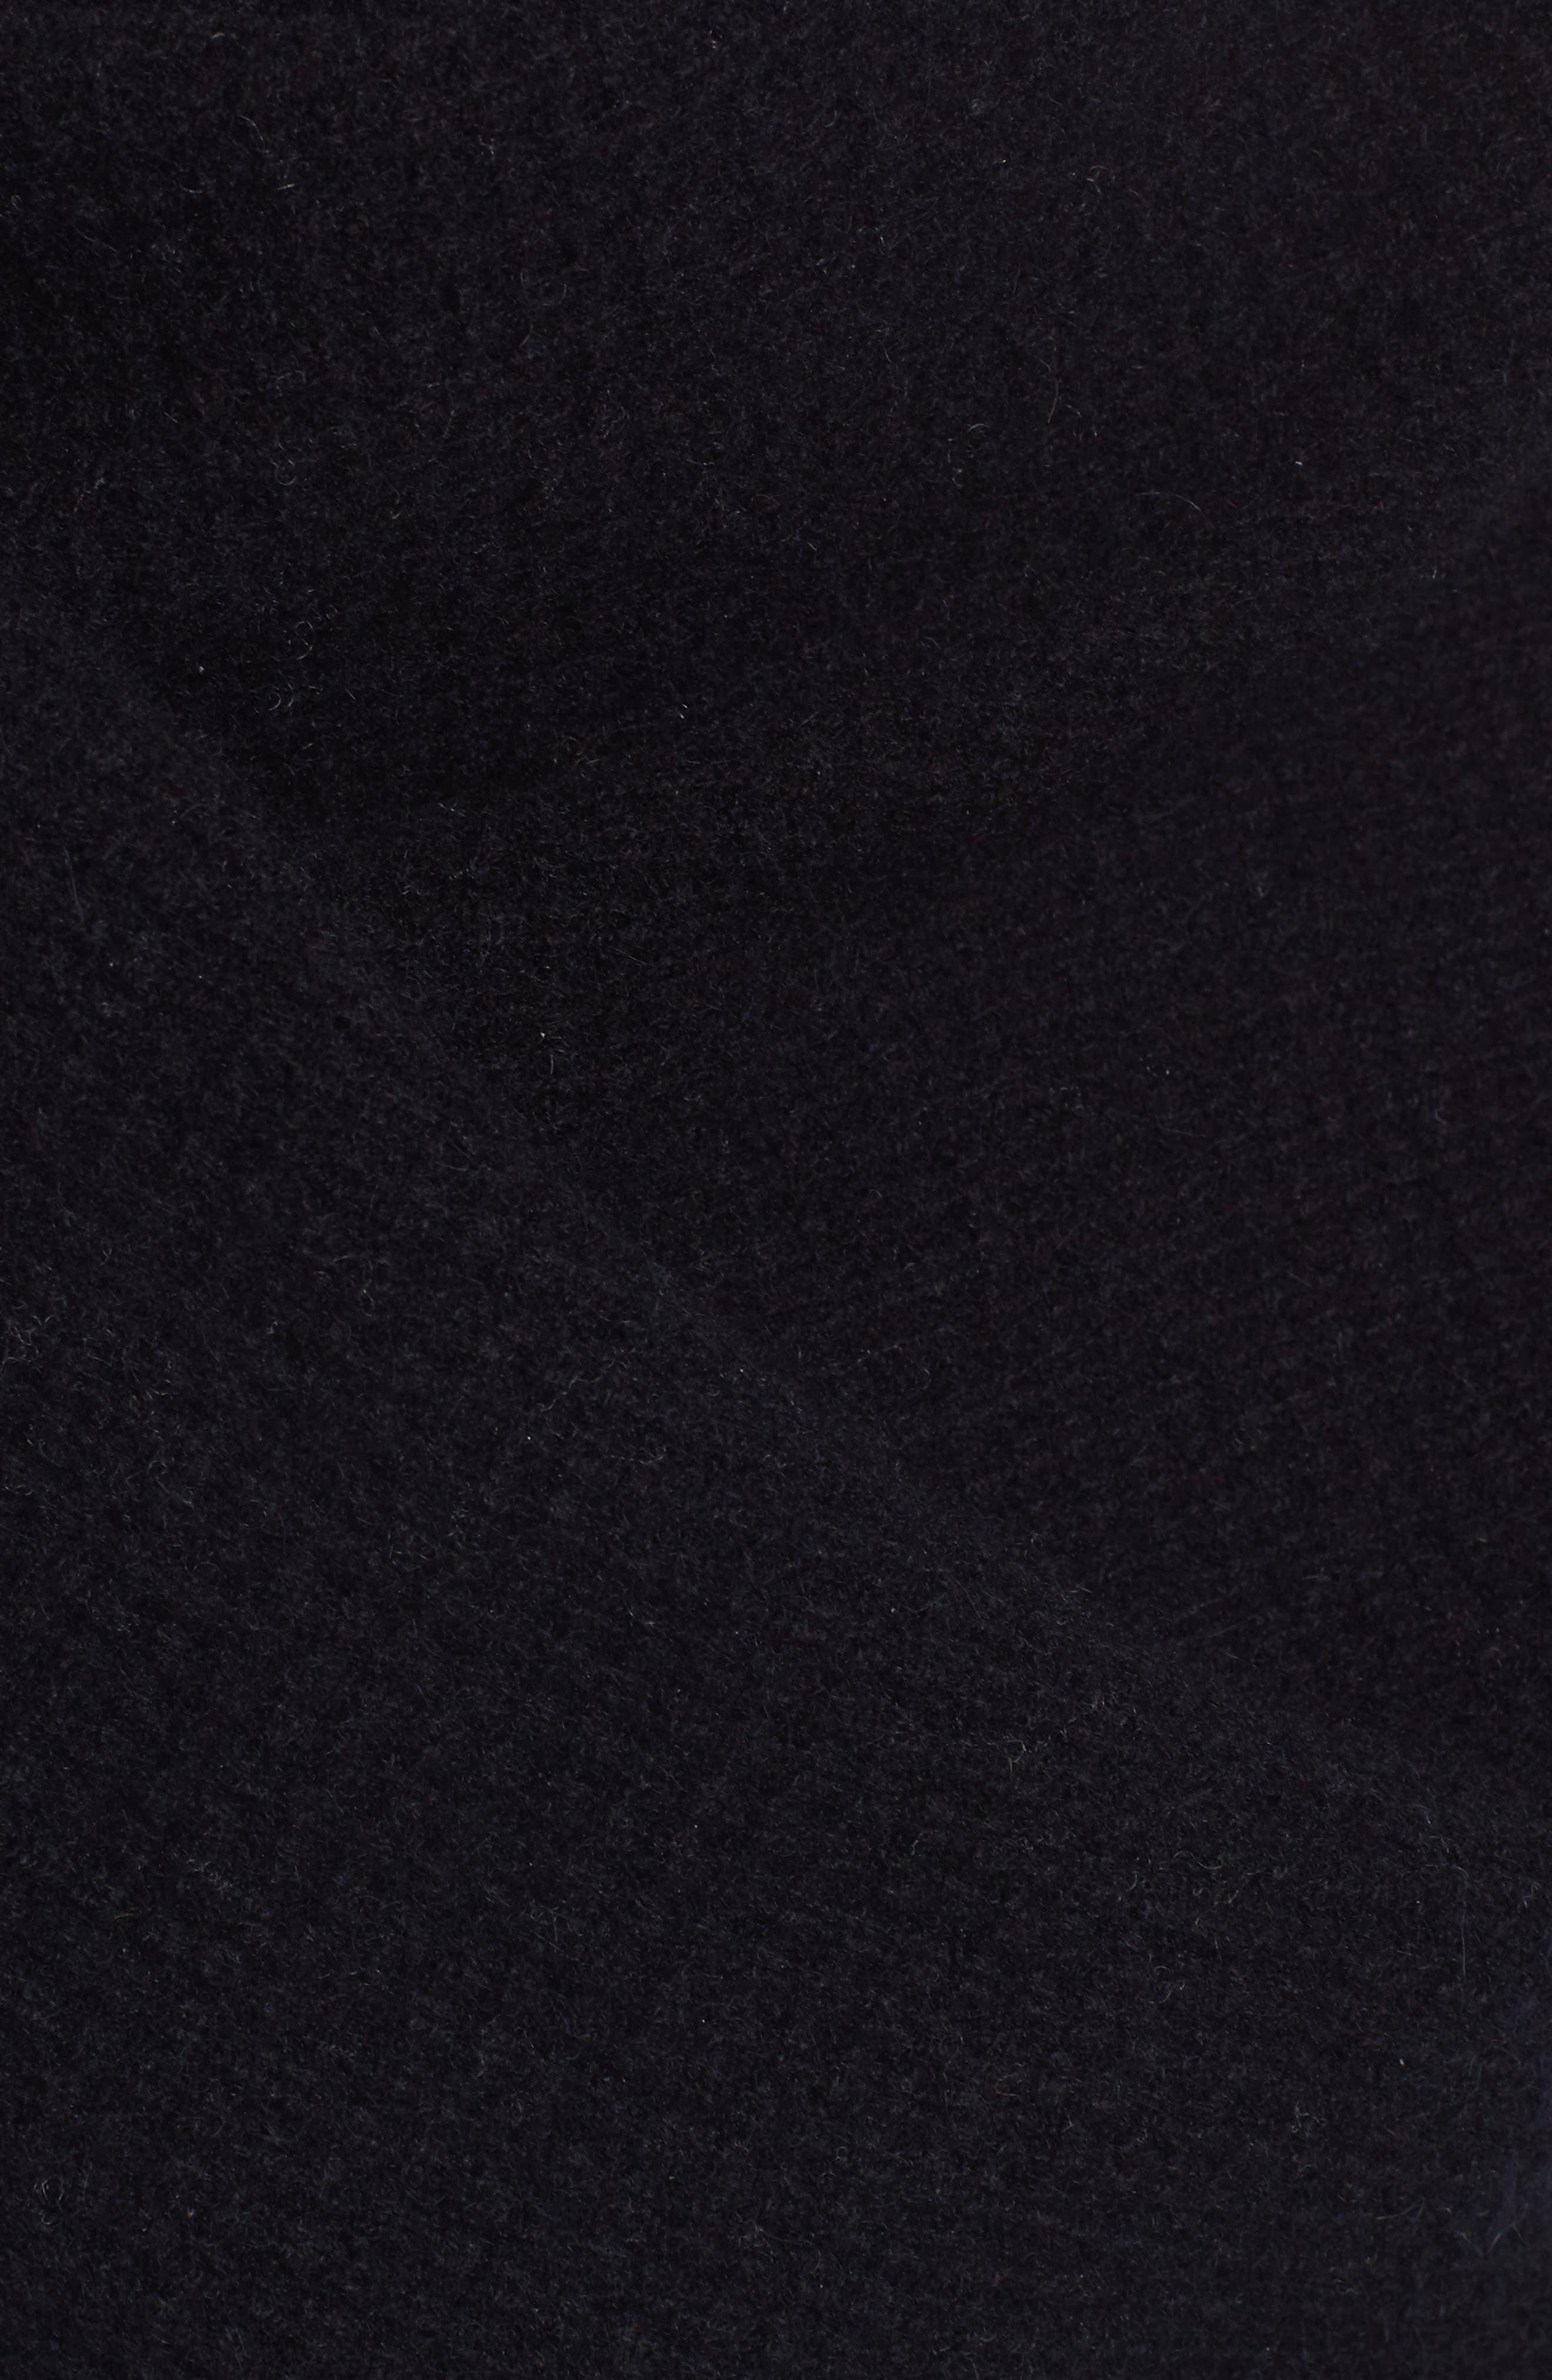 Waffle Knit Cashmere Wrap,                             Alternate thumbnail 21, color,